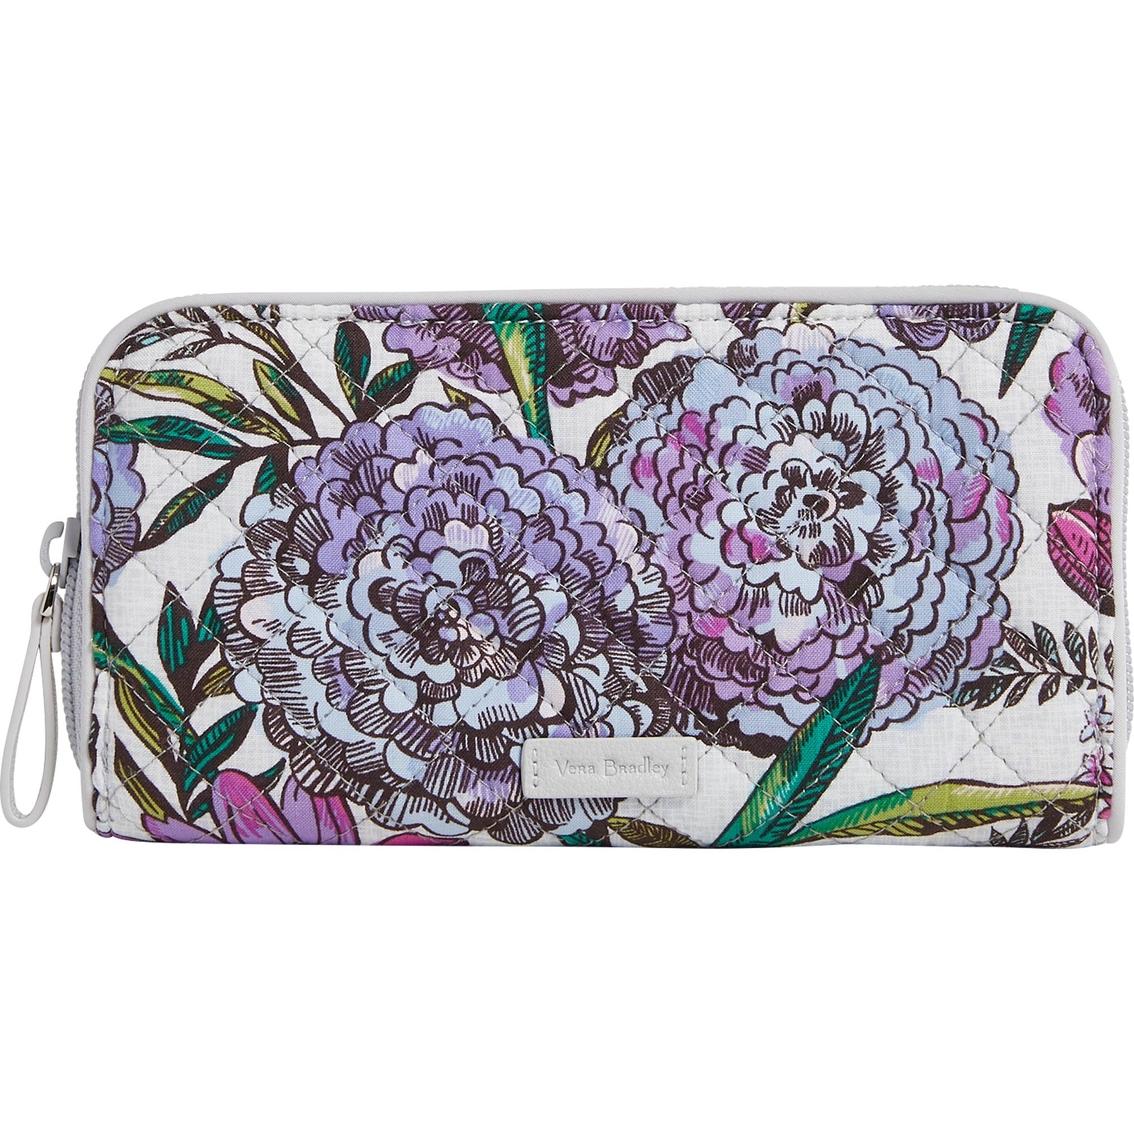 938bc5957 Vera Bradley Rfid Georgia Wallet Signature Cotton, Lavender Meadow ...